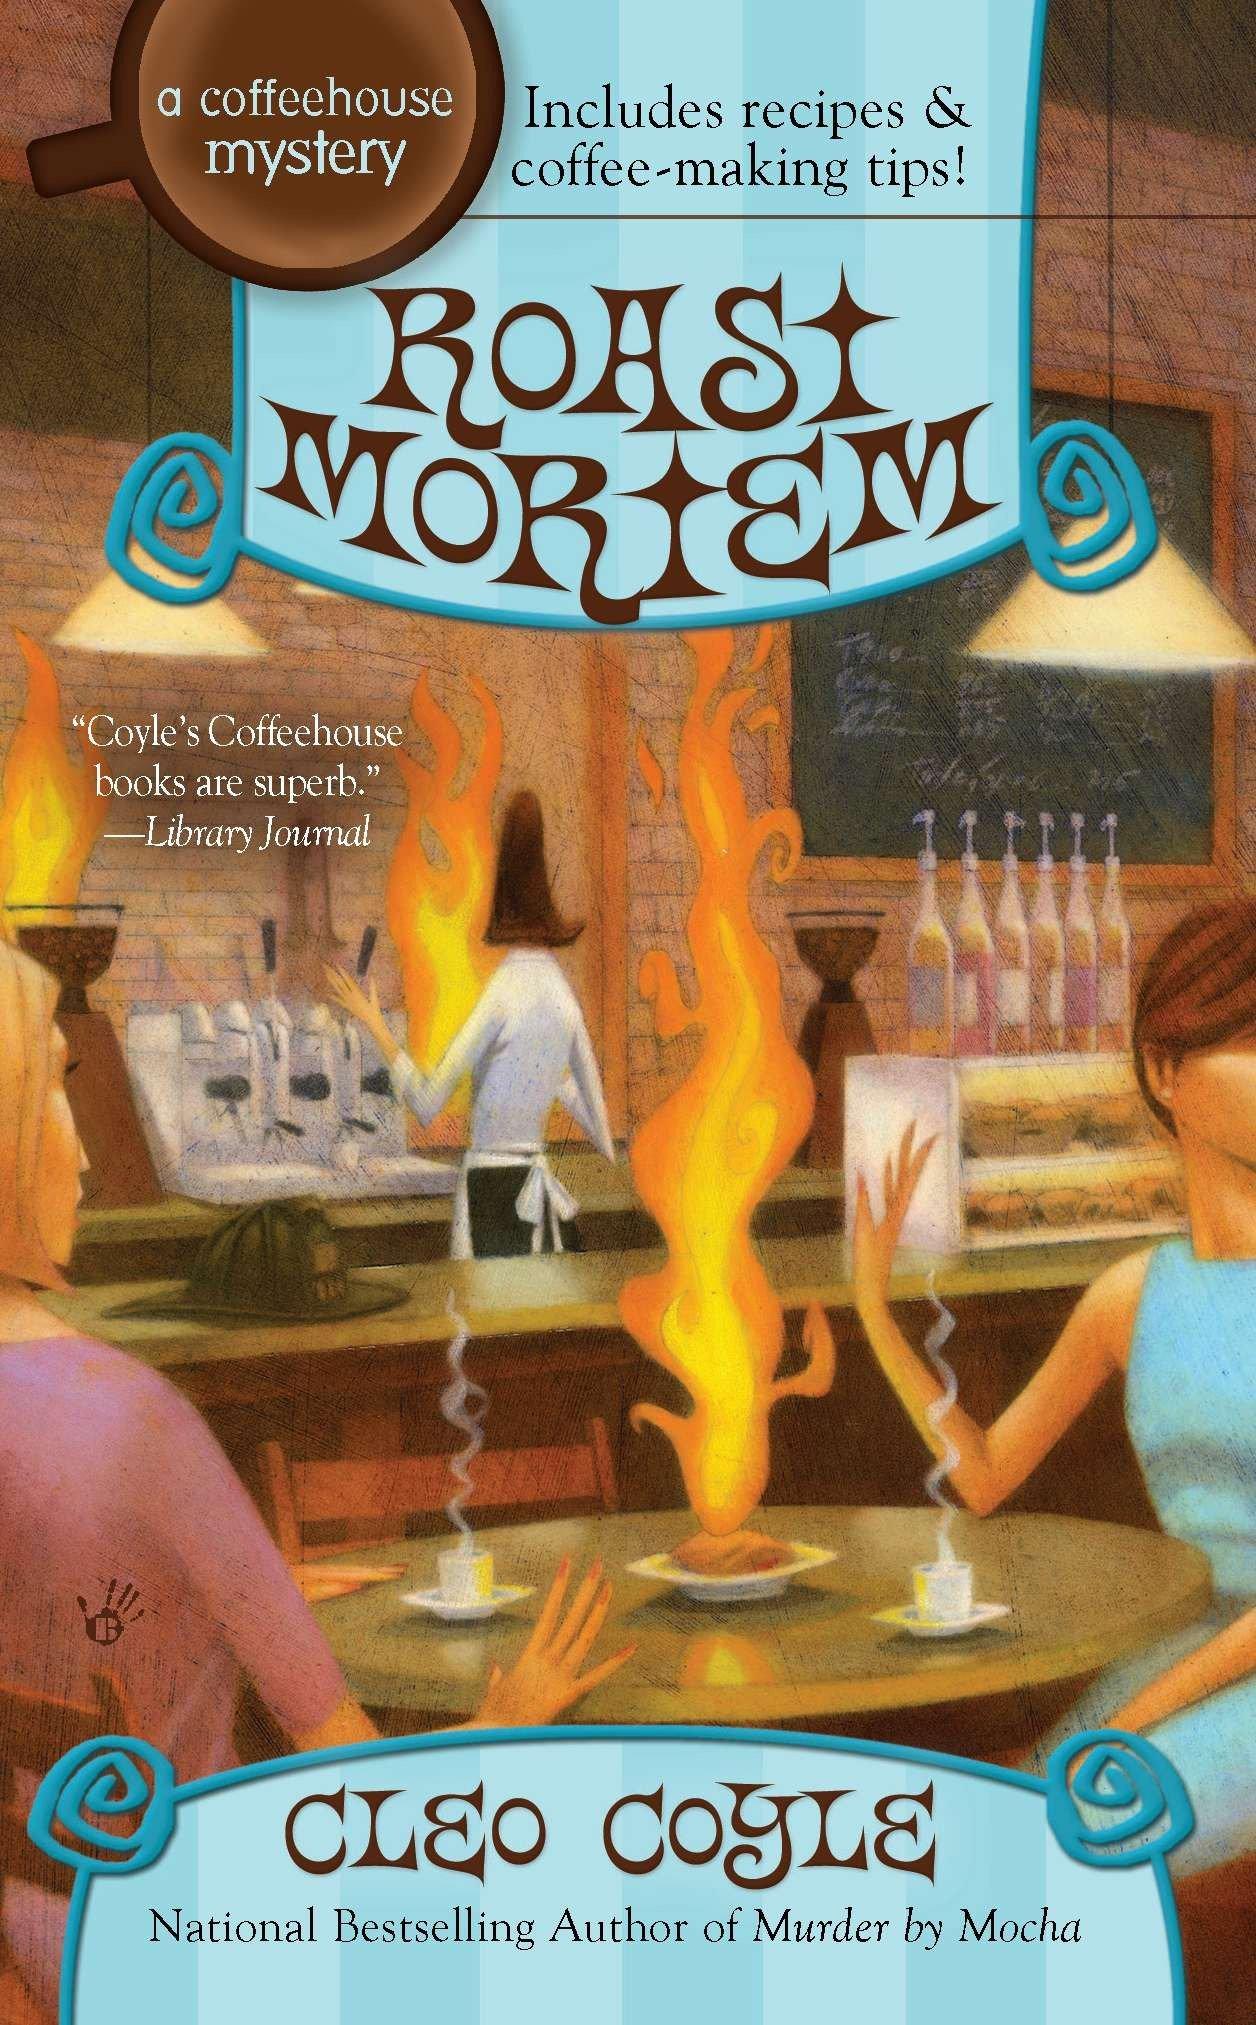 Roast Mortem A Coffeehouse Mystery  ebook by Cleo Coyle